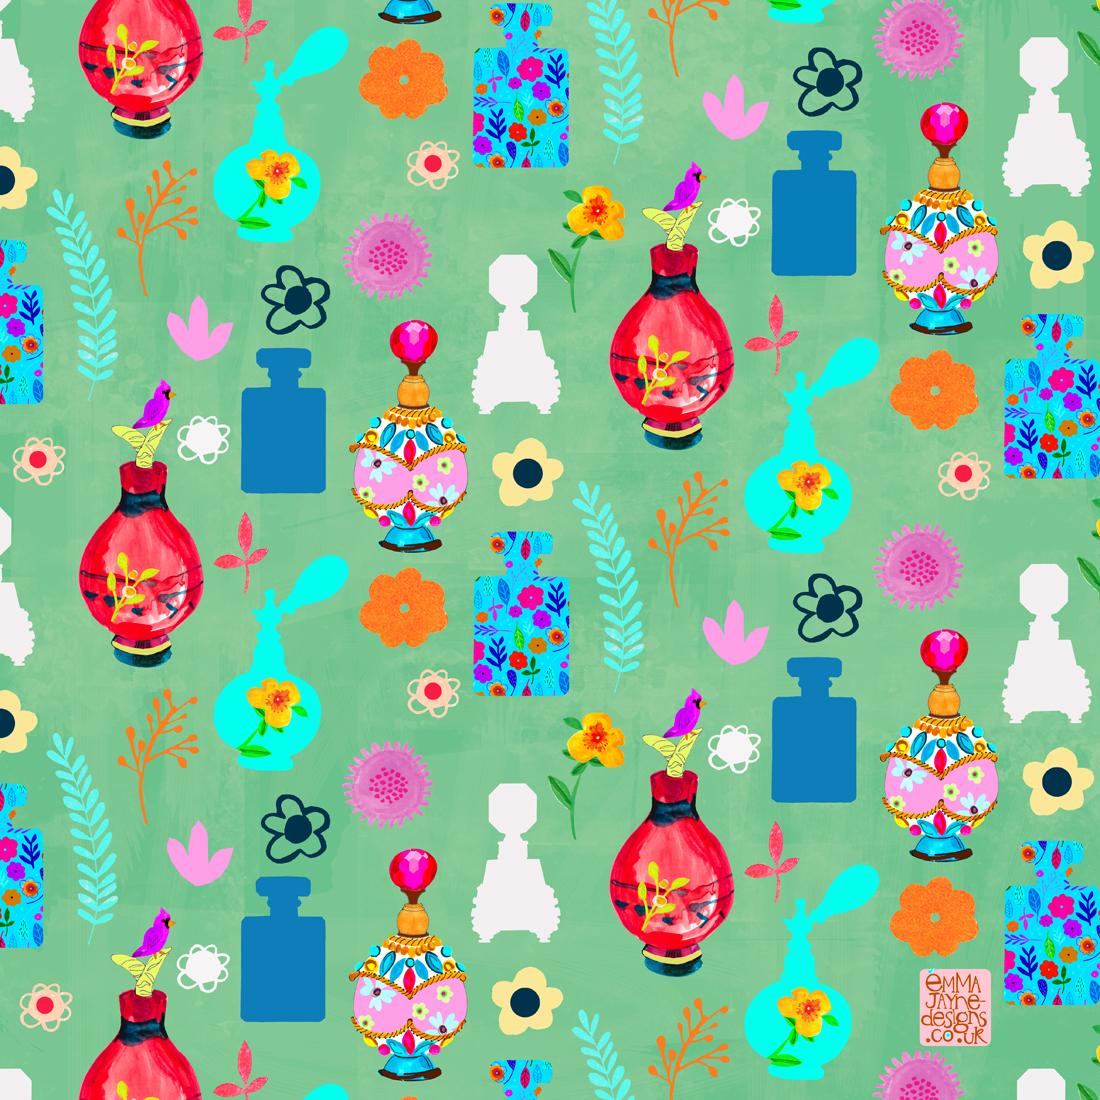 floral-perfume-card-set2-emmajayne-designs